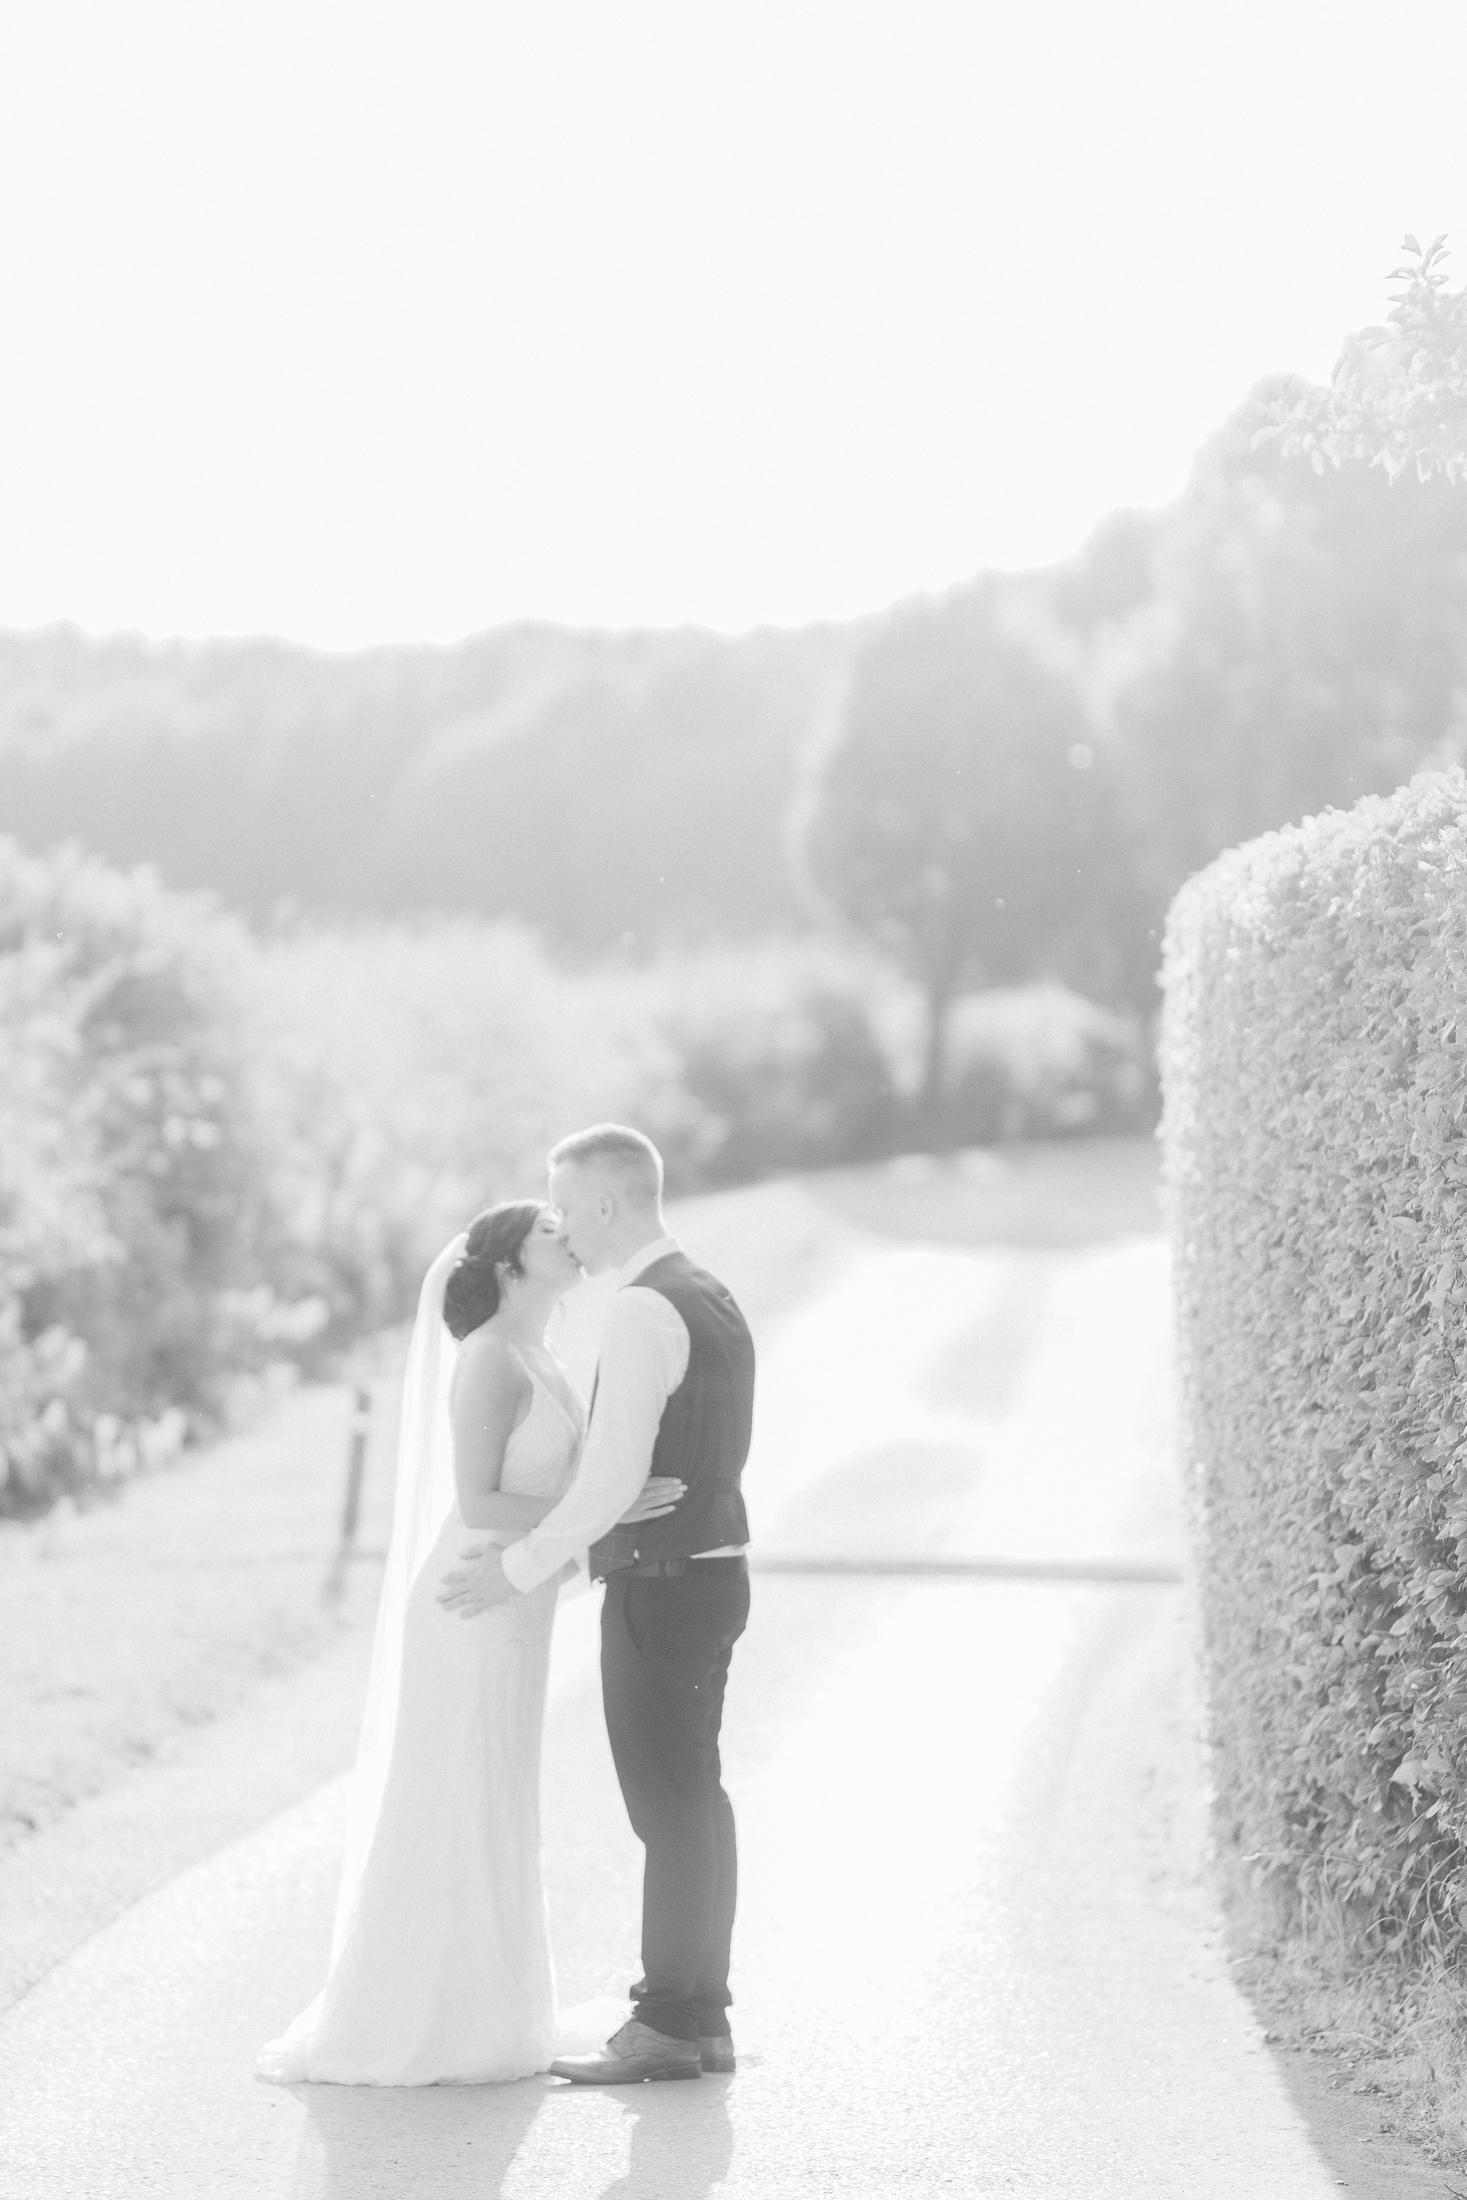 Oxfordshire-wedding-photographer-79.jpg